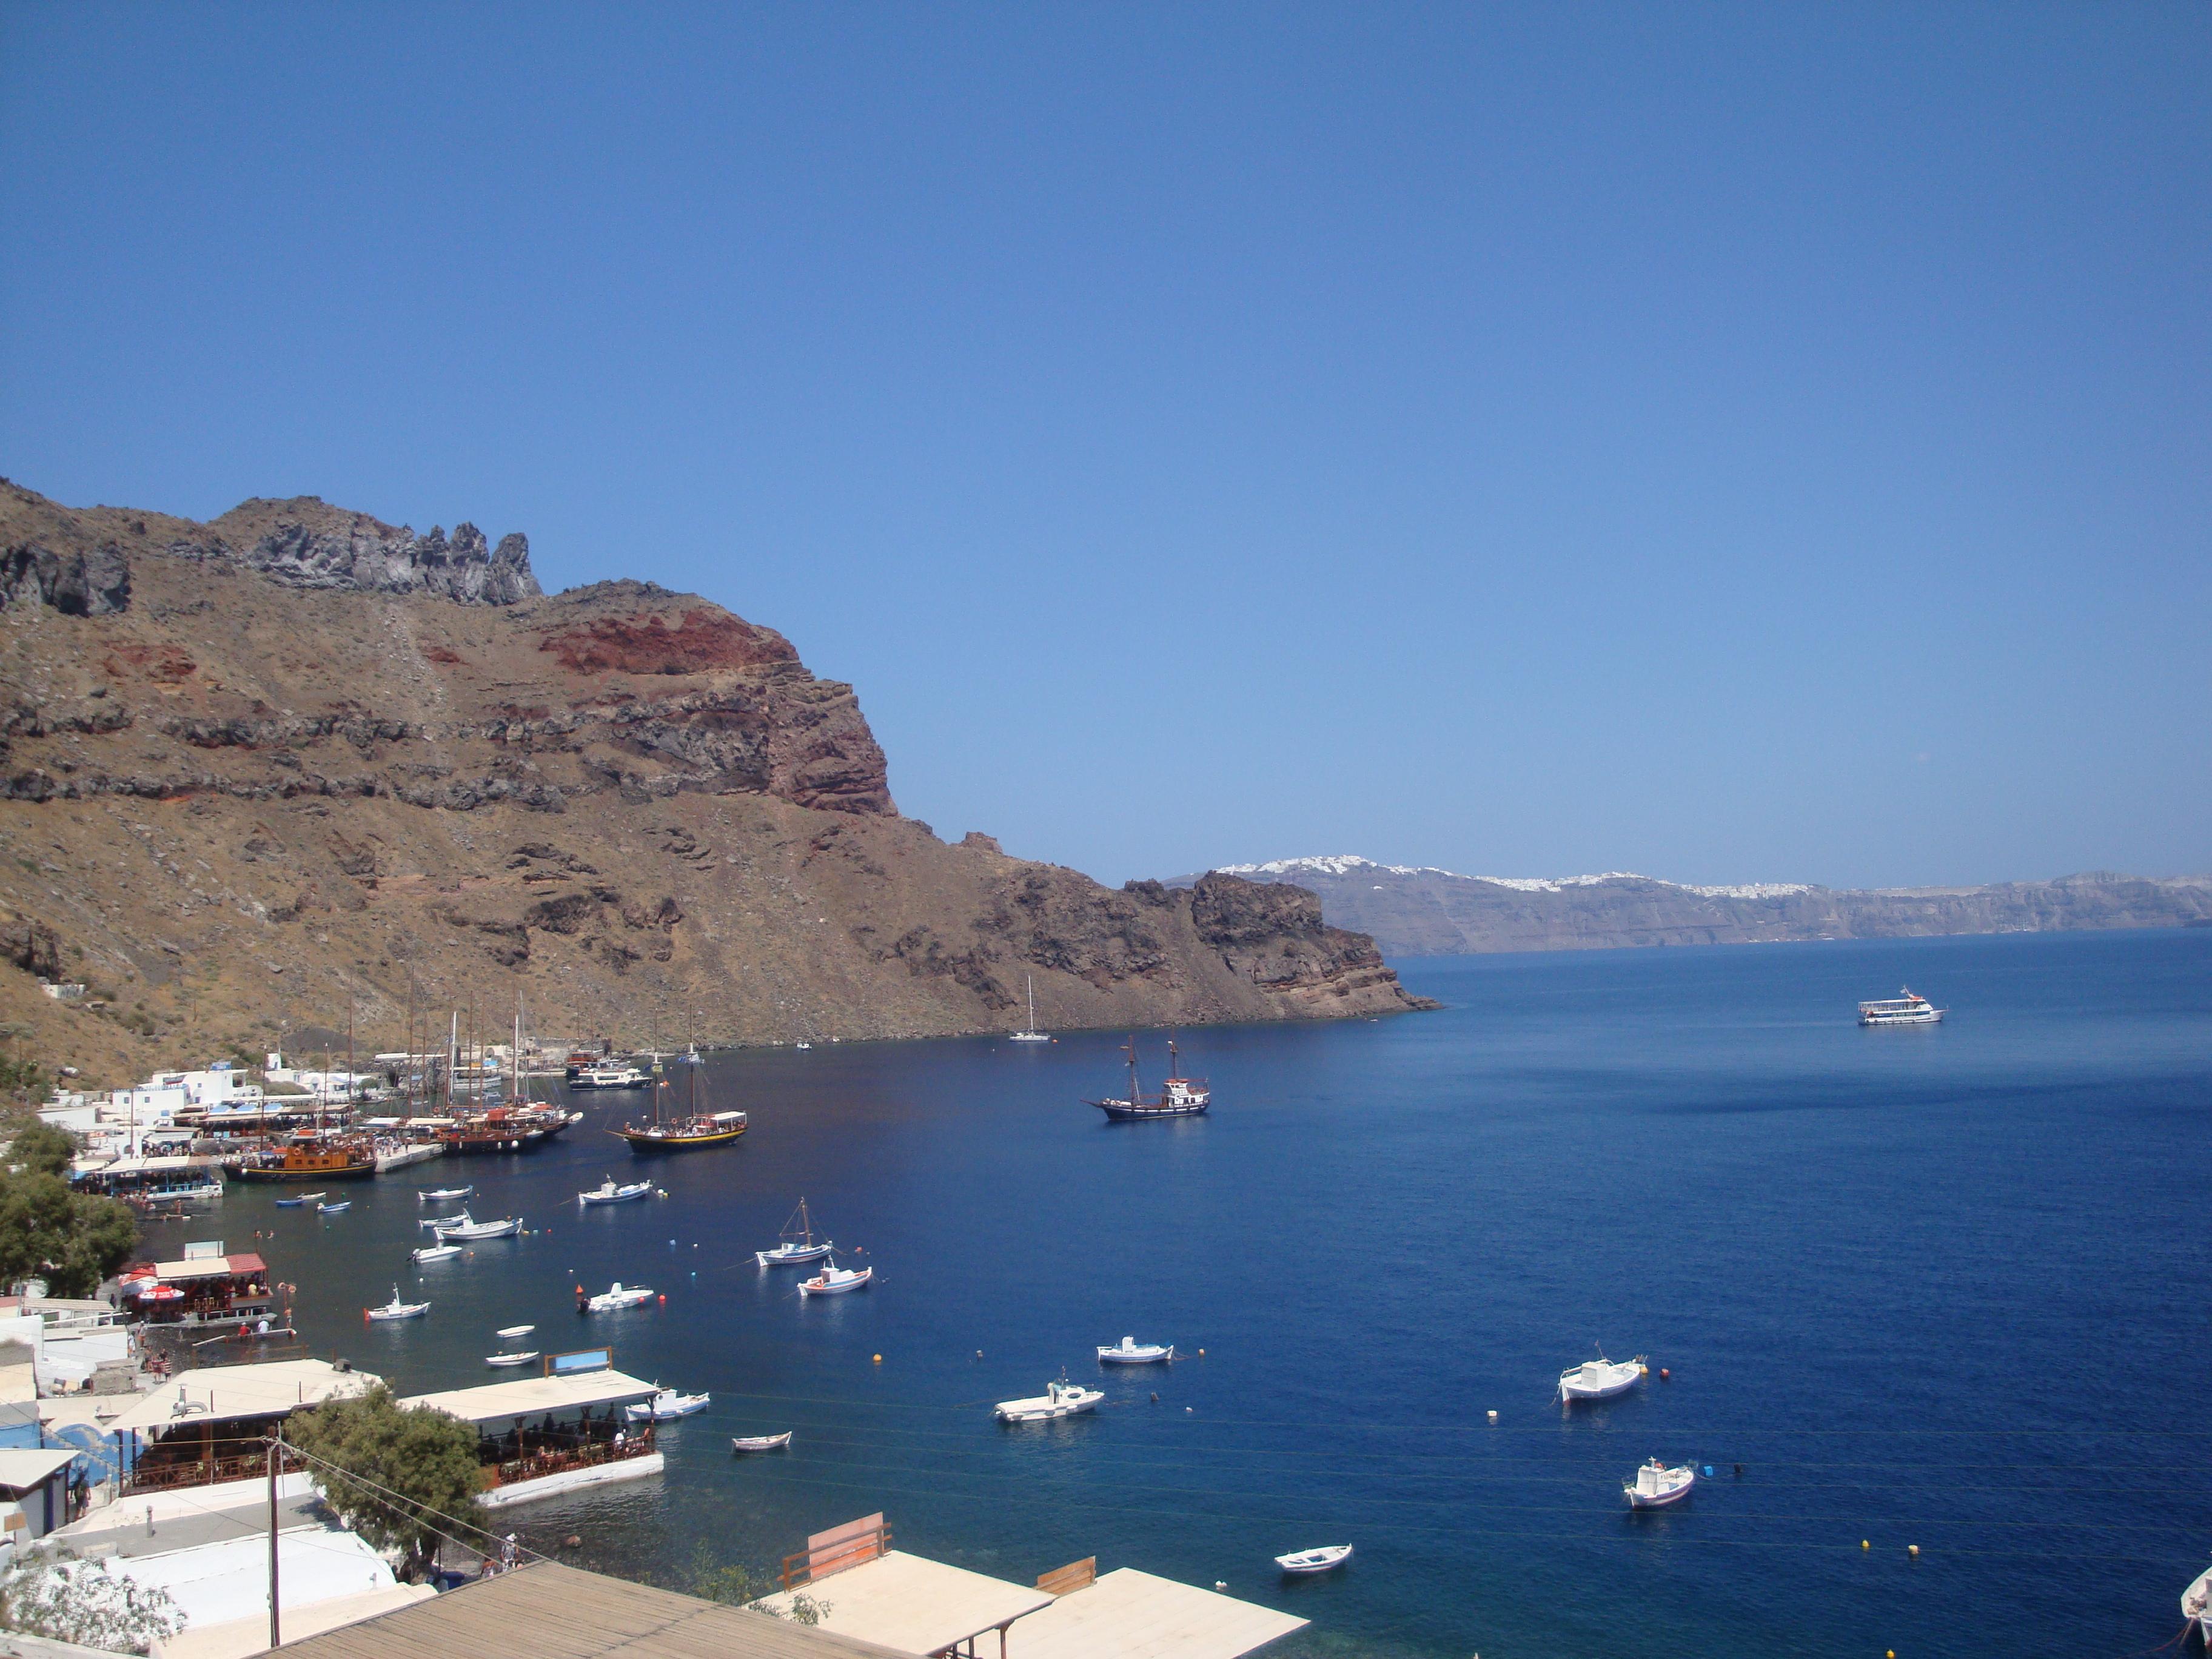 13. Picturesque harbor of Therasia Island - (Θηρασία) Santorini